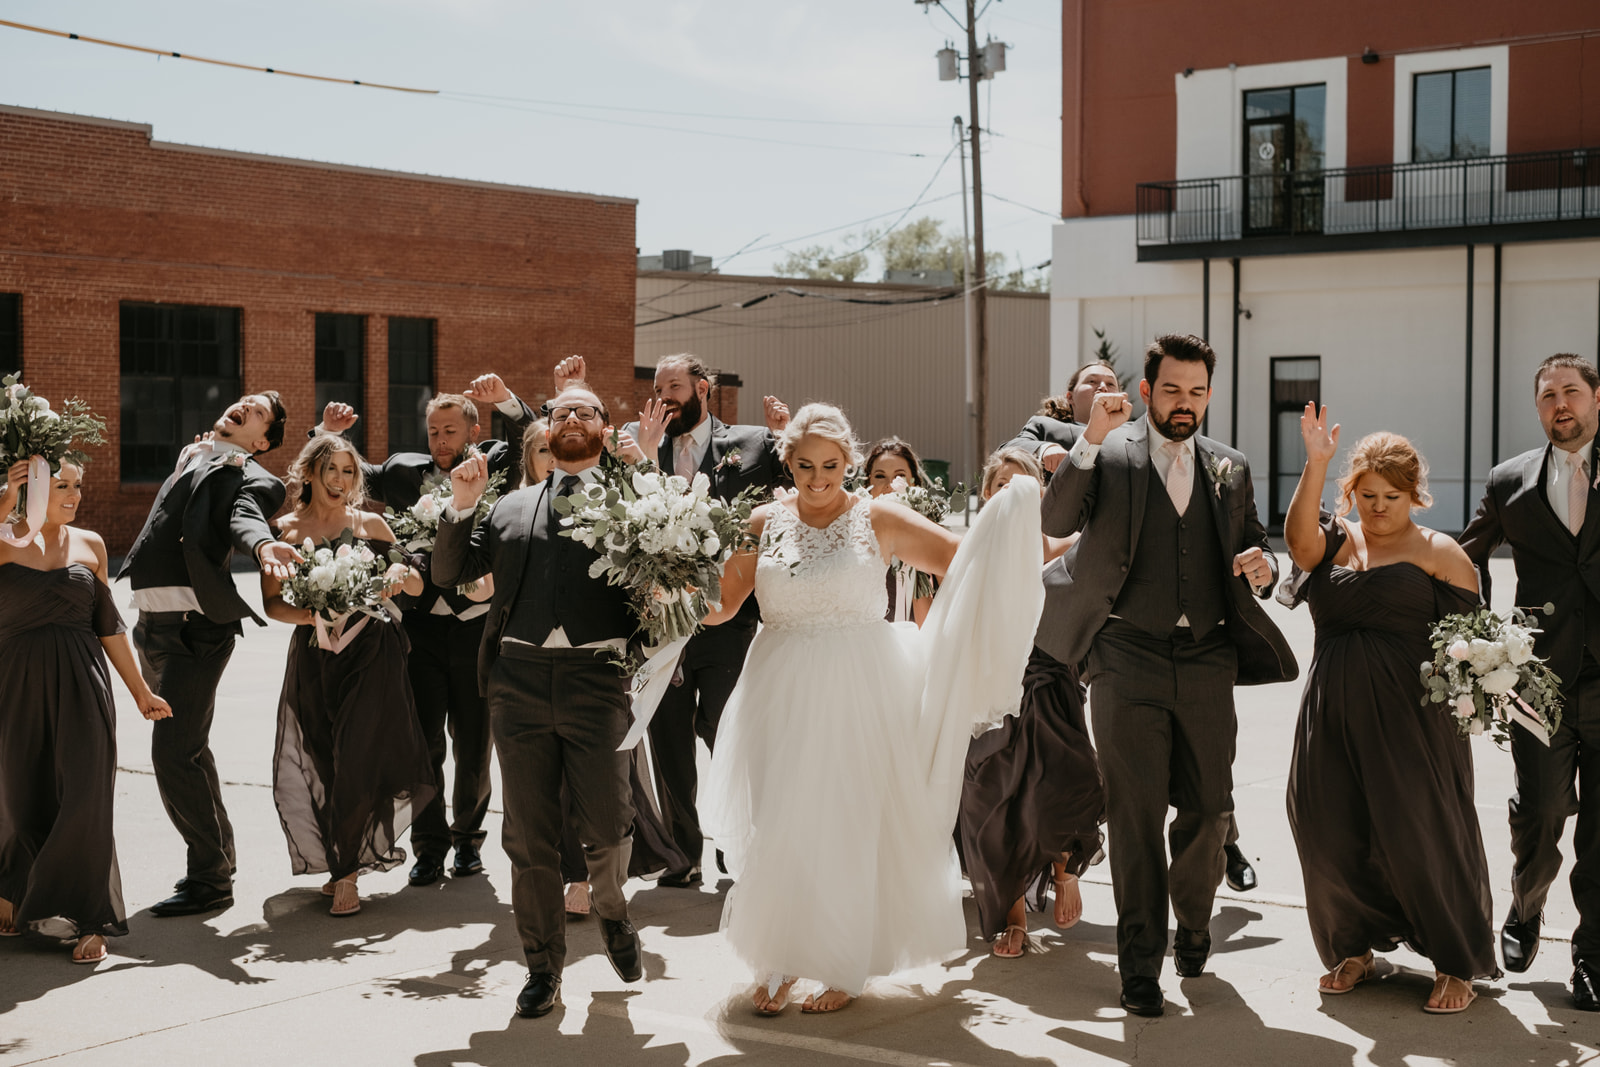 Bridal Party Outfit Ideas_Kansas City